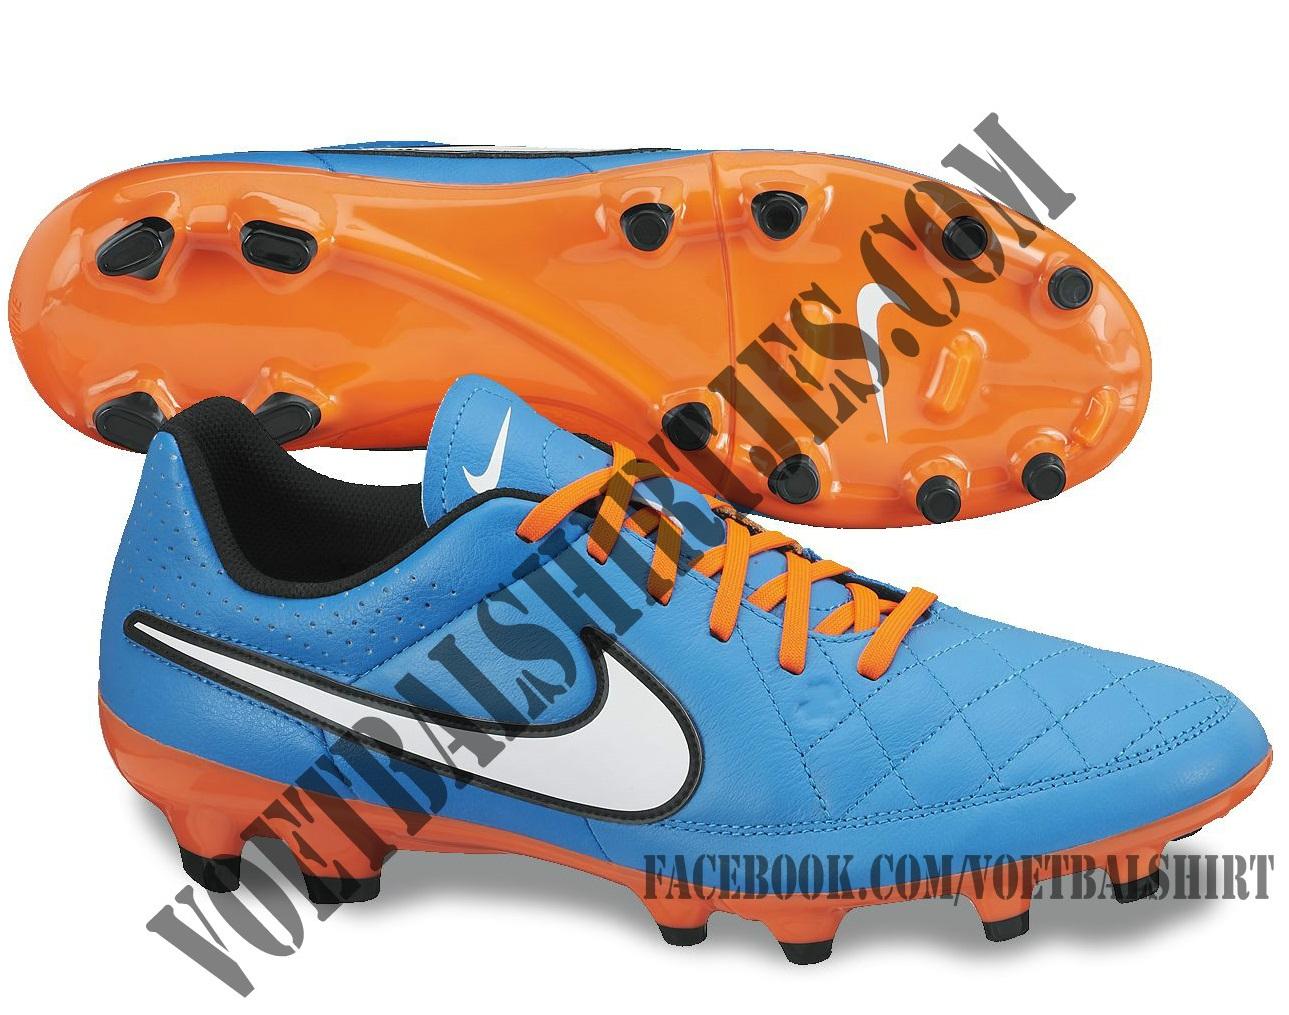 Nike-Tiempo-Leather_FG.jpg